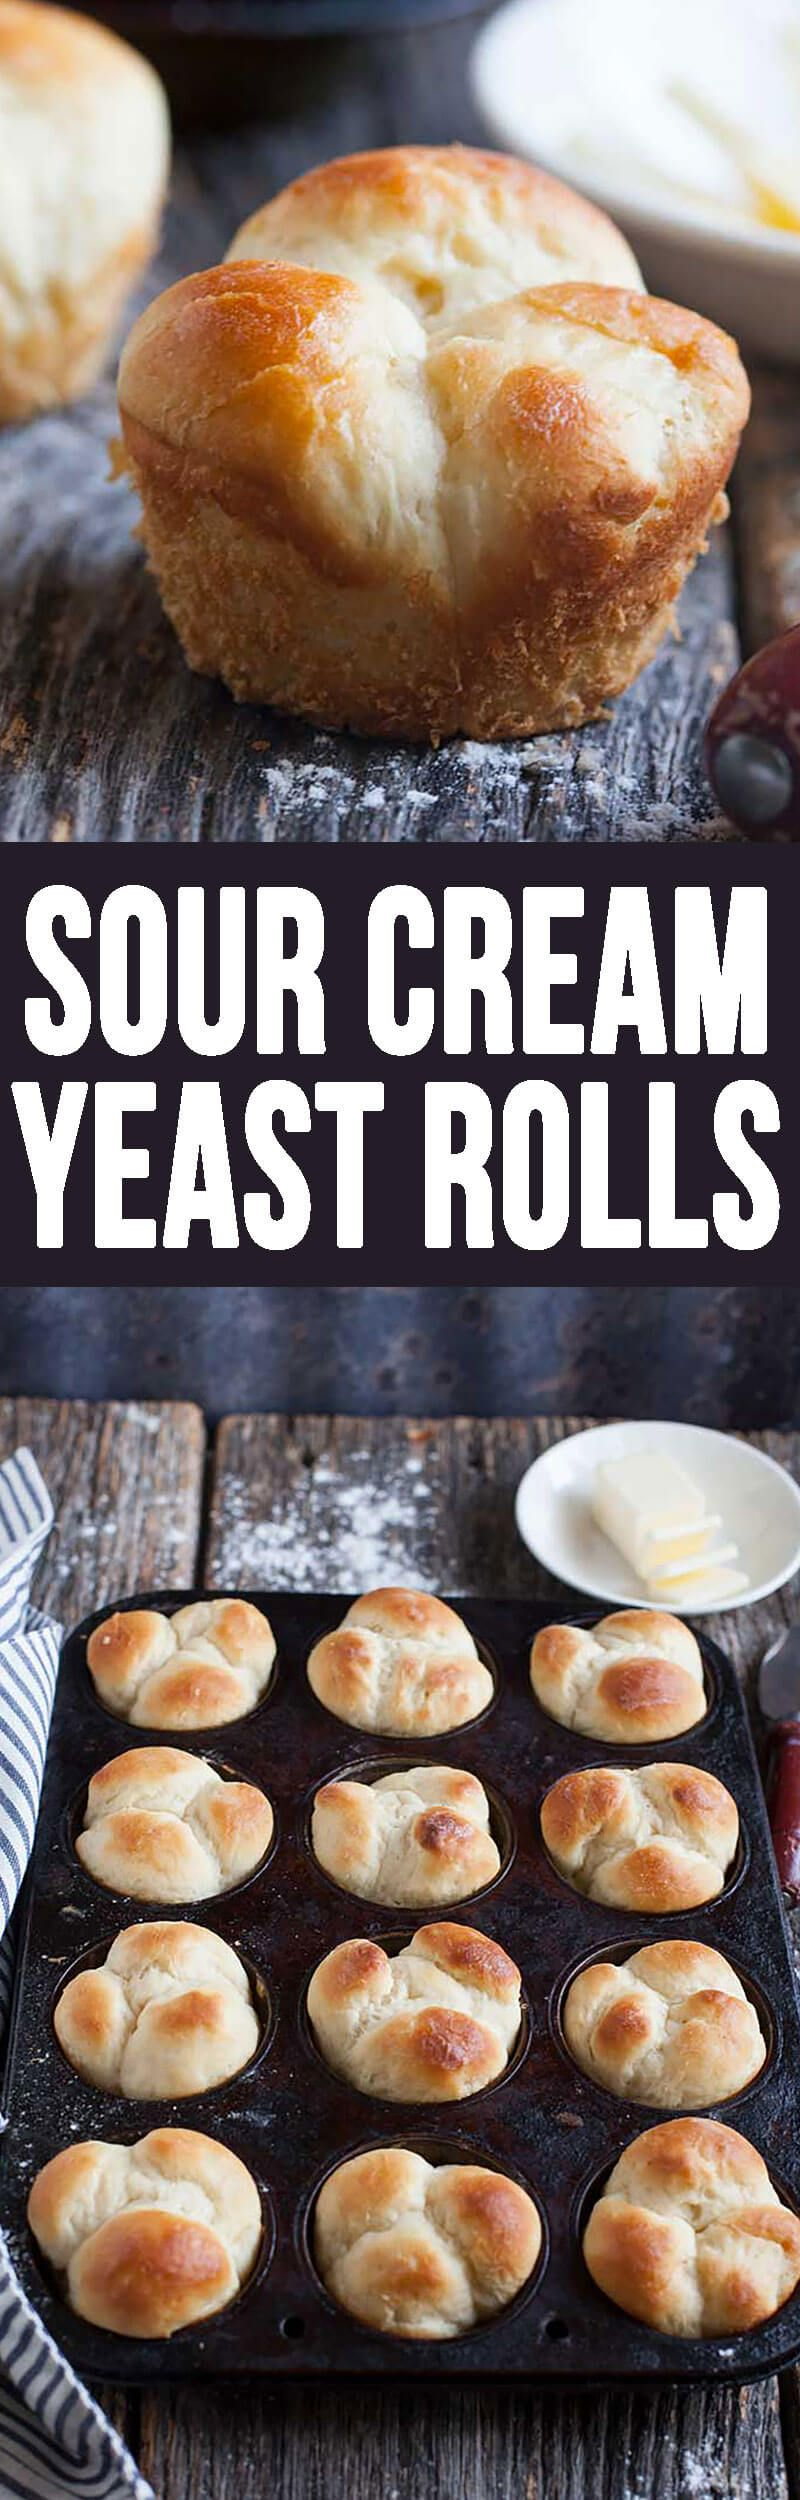 Sour Cream Yeast Rolls Easy Peasy Meals Recipe Yeast Rolls Diy Food Recipes Easy Yeast Rolls